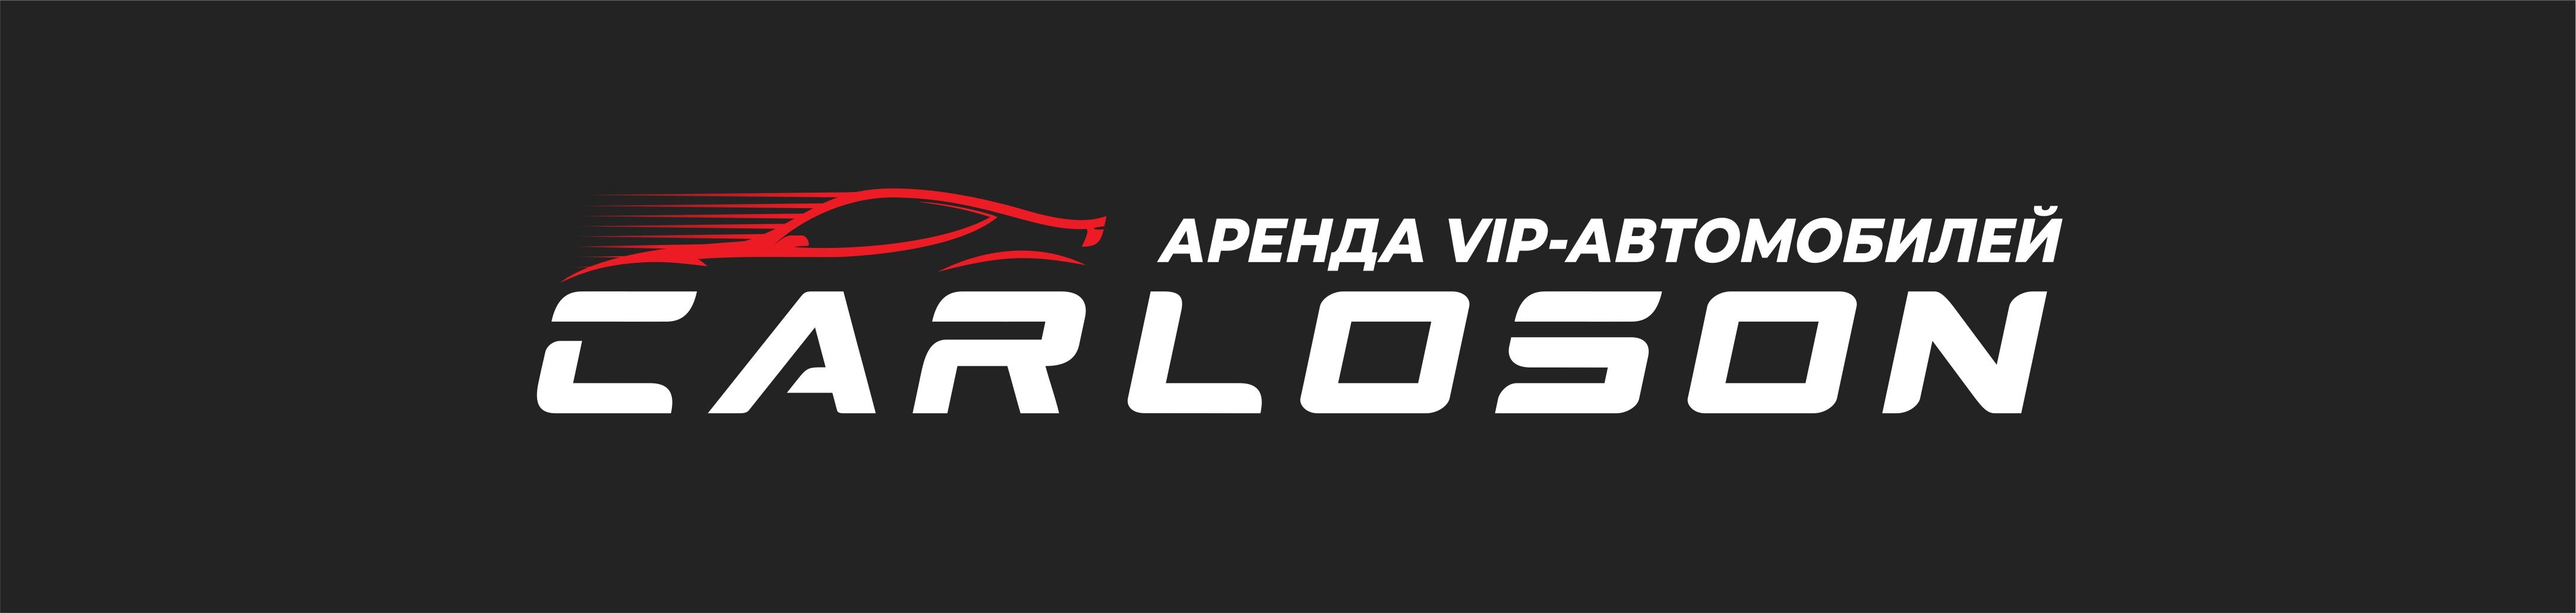 Логотип для компании по прокату  VIP автомобилей фото f_3385adcced37c2c0.jpg